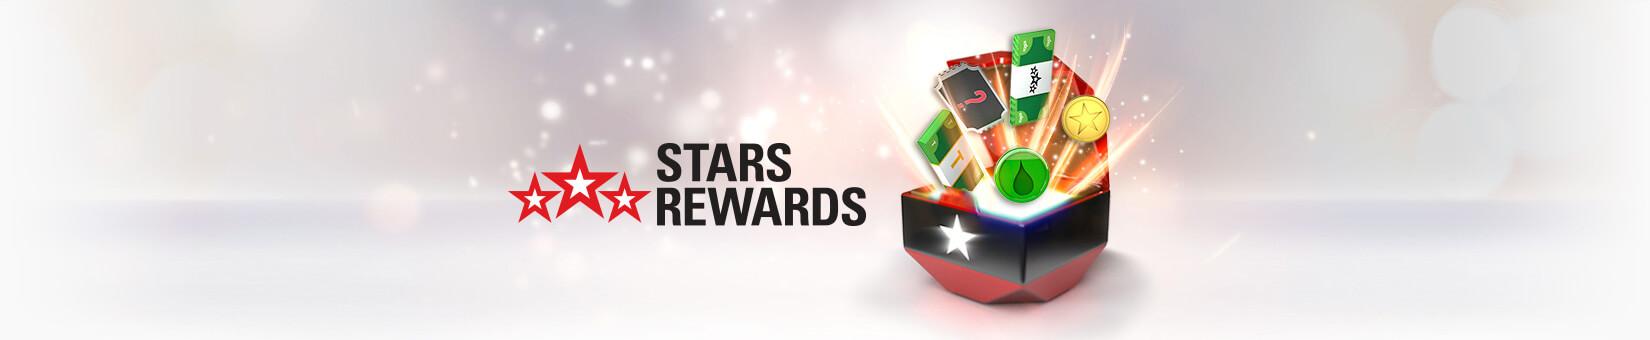 url casino stars rewards earn